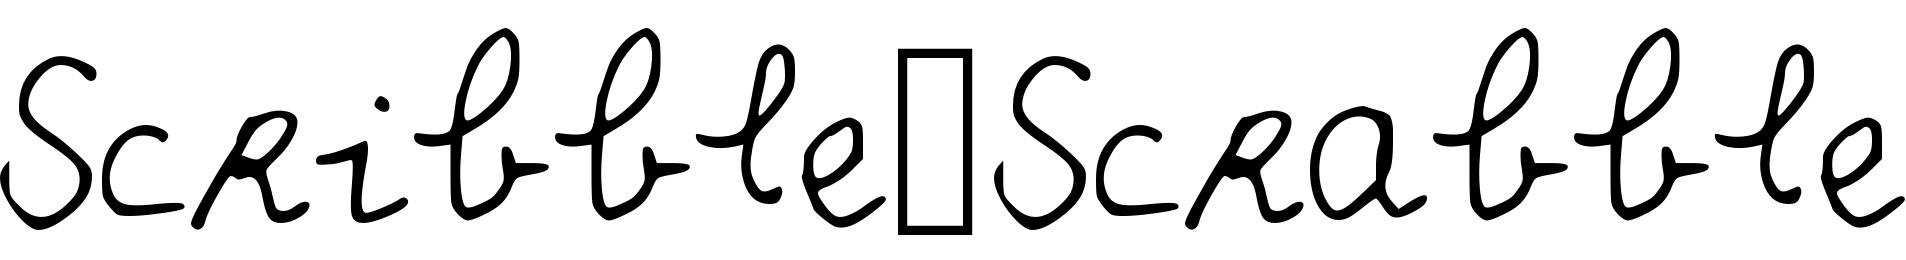 Scribble_Scrabble